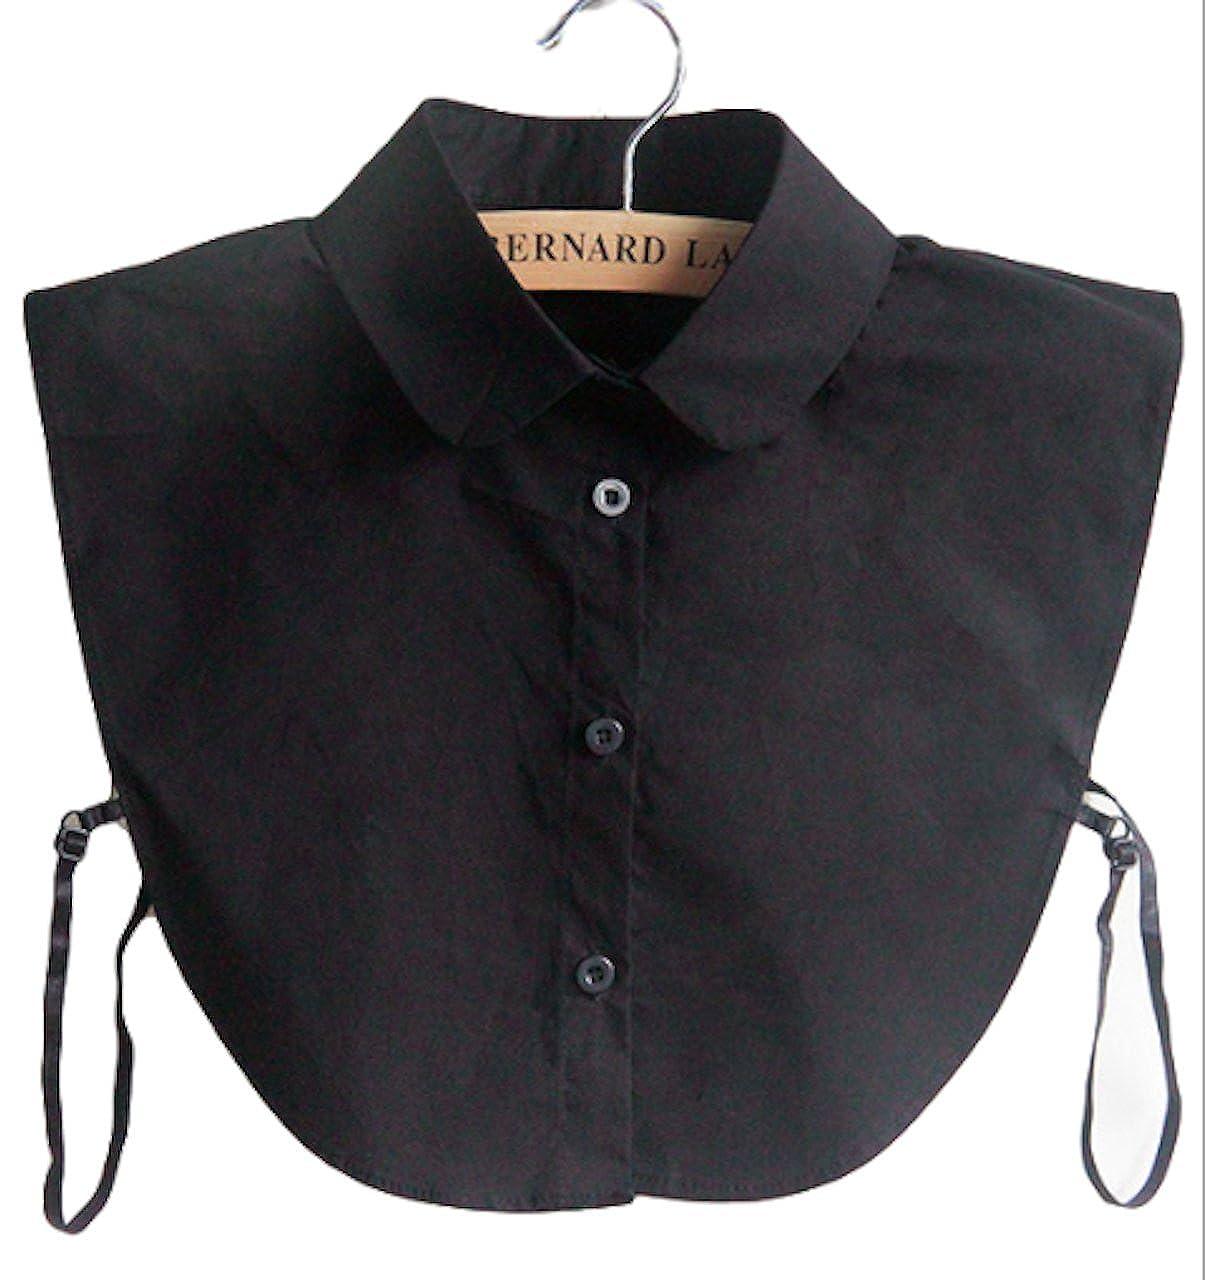 20ffd1cc484660 Top3: P-LINK False Collar Fake Half Shirt Blouse Neat Cute Wearing for  Girls and Women